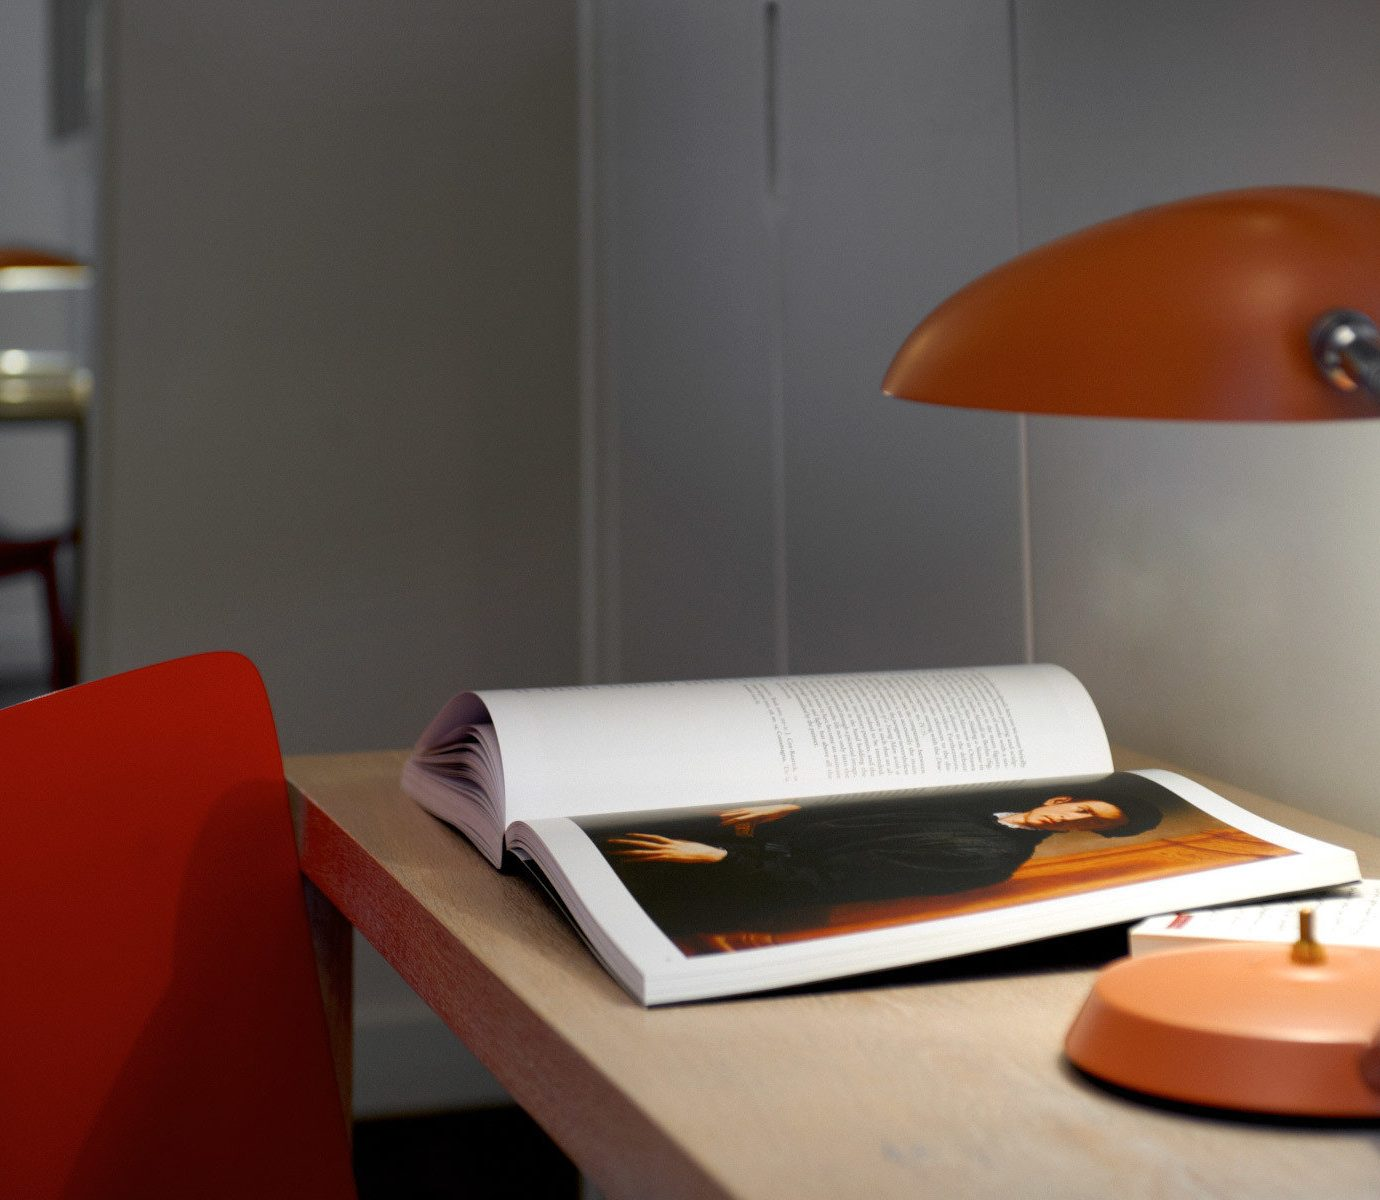 Business City Hip Modern desk office orange lamp